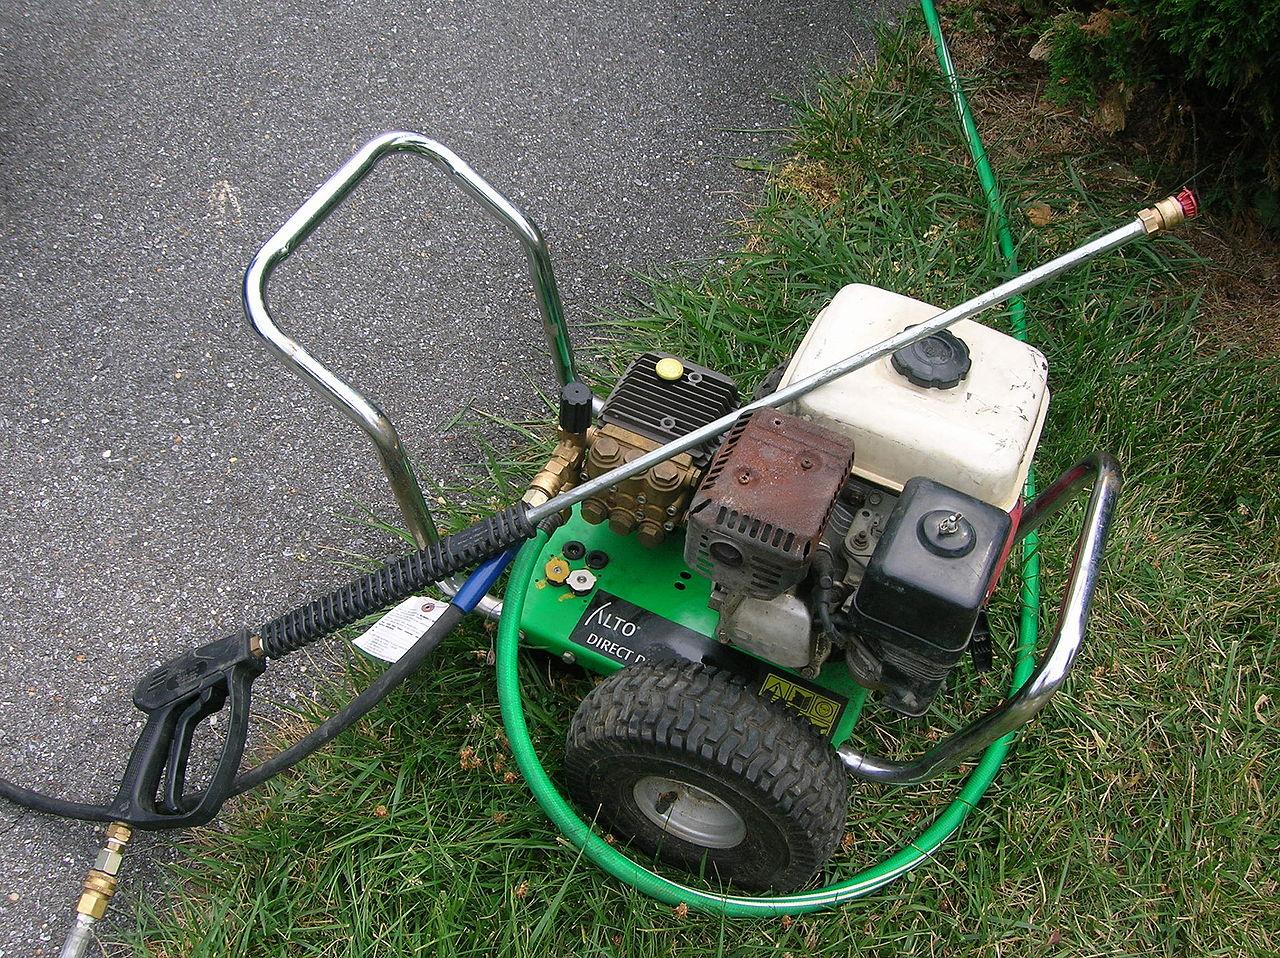 Car Washing Electric Pressure Washer